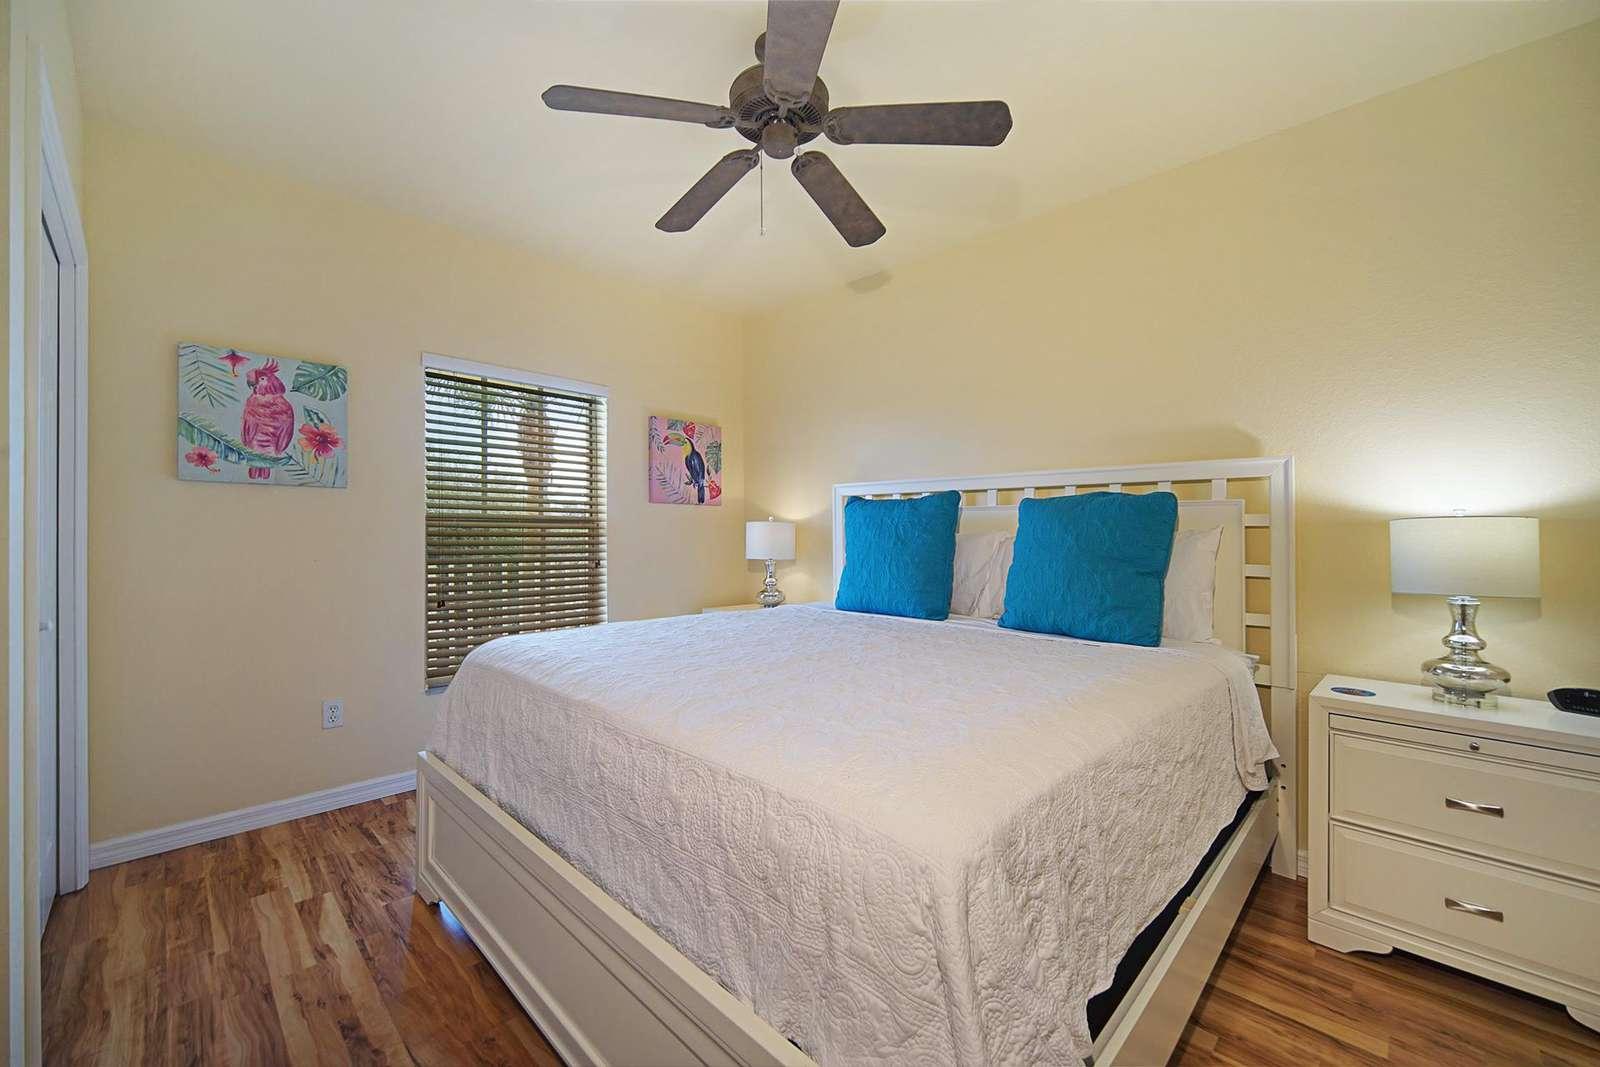 Wischis Florida Home - Ferienhaus Naples - Fort Myers - Cape Coral - Hausverwaltung - Immobilien